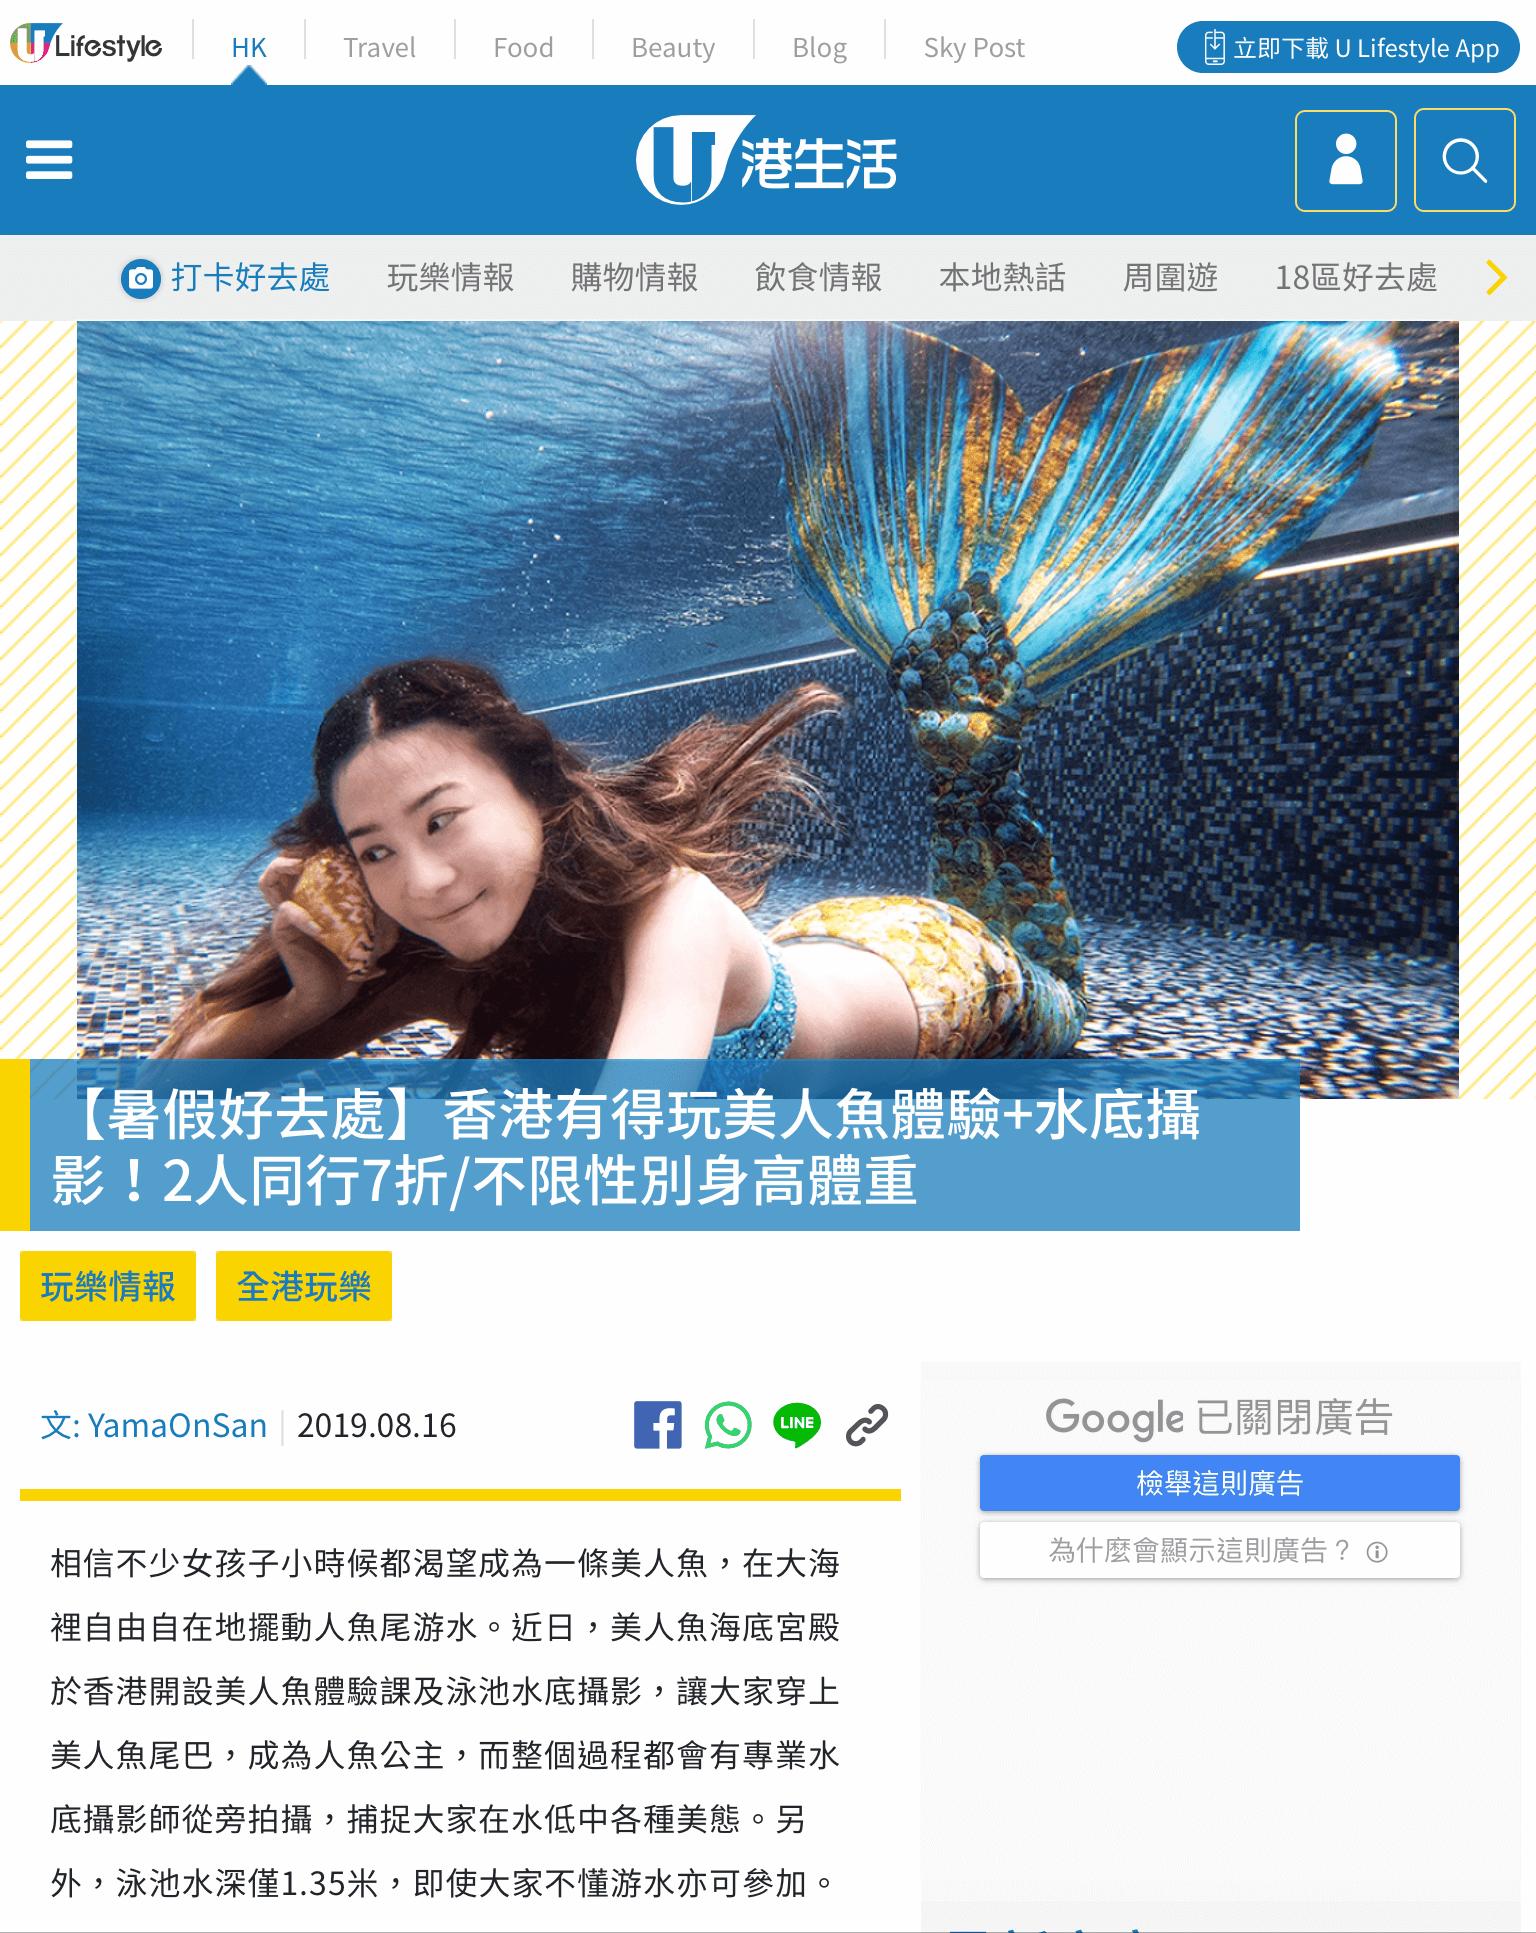 [U Lifestyle港生活] 香港有得玩美人魚體驗+水底攝影!